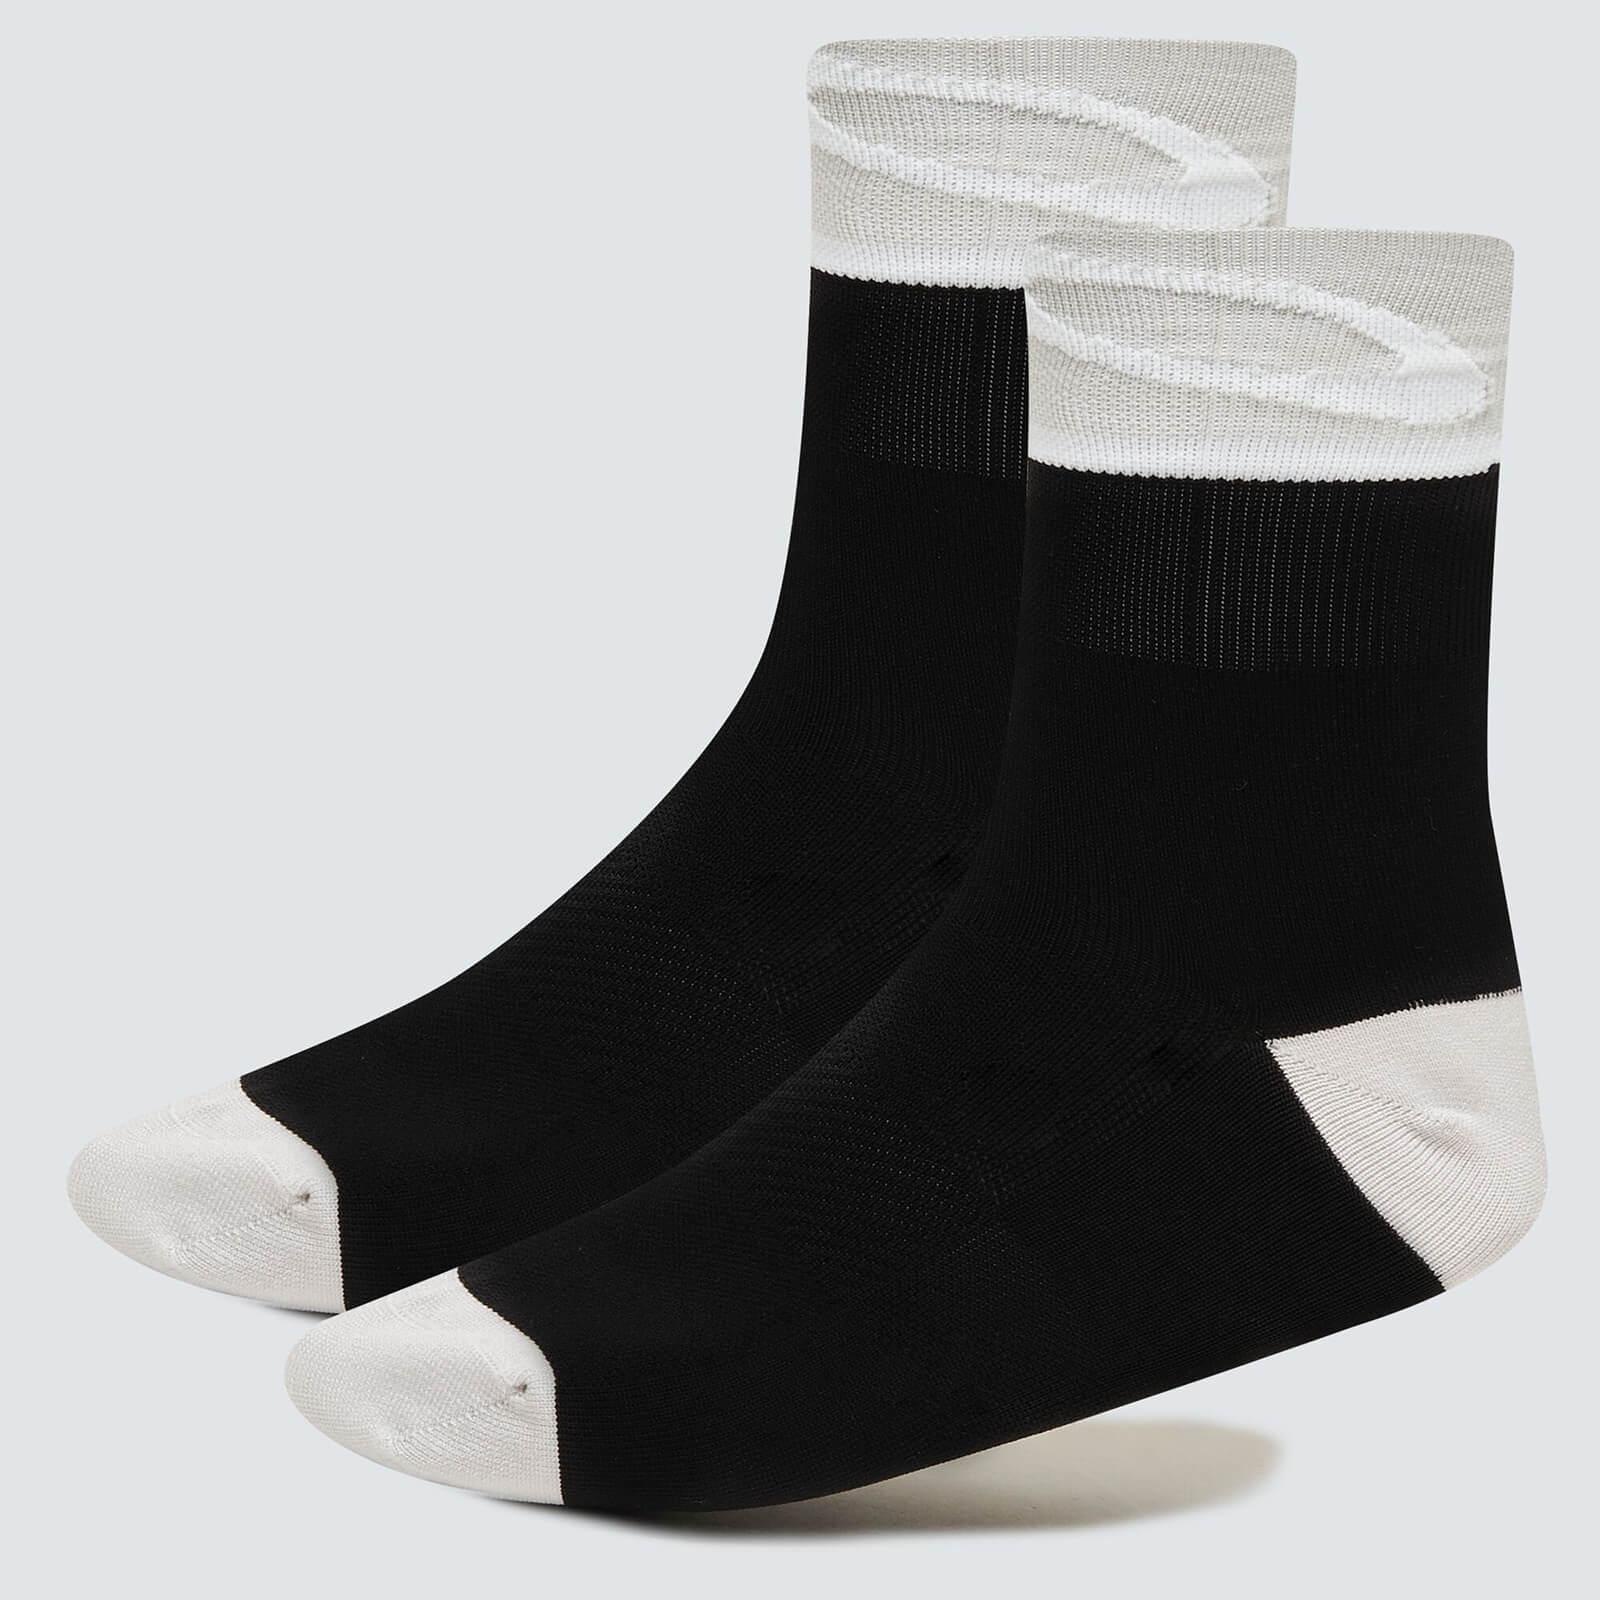 Oakley 3.0 Cycling Socks - XL - Blackout